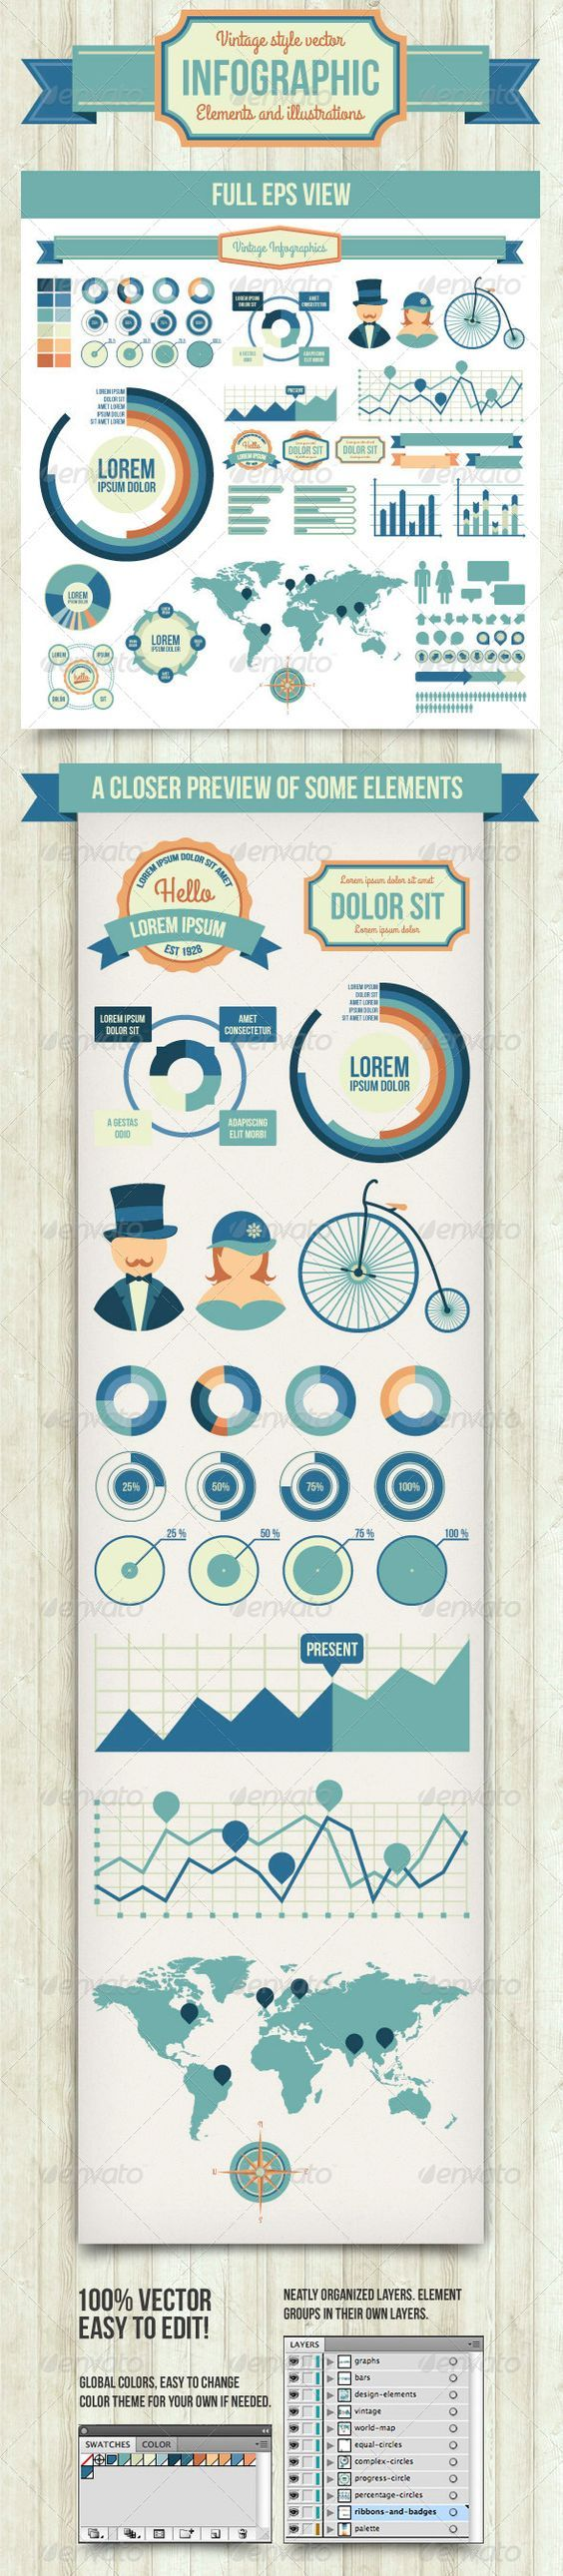 10 best Ui Stats images on Pinterest | Dashboard design, Analytics ...